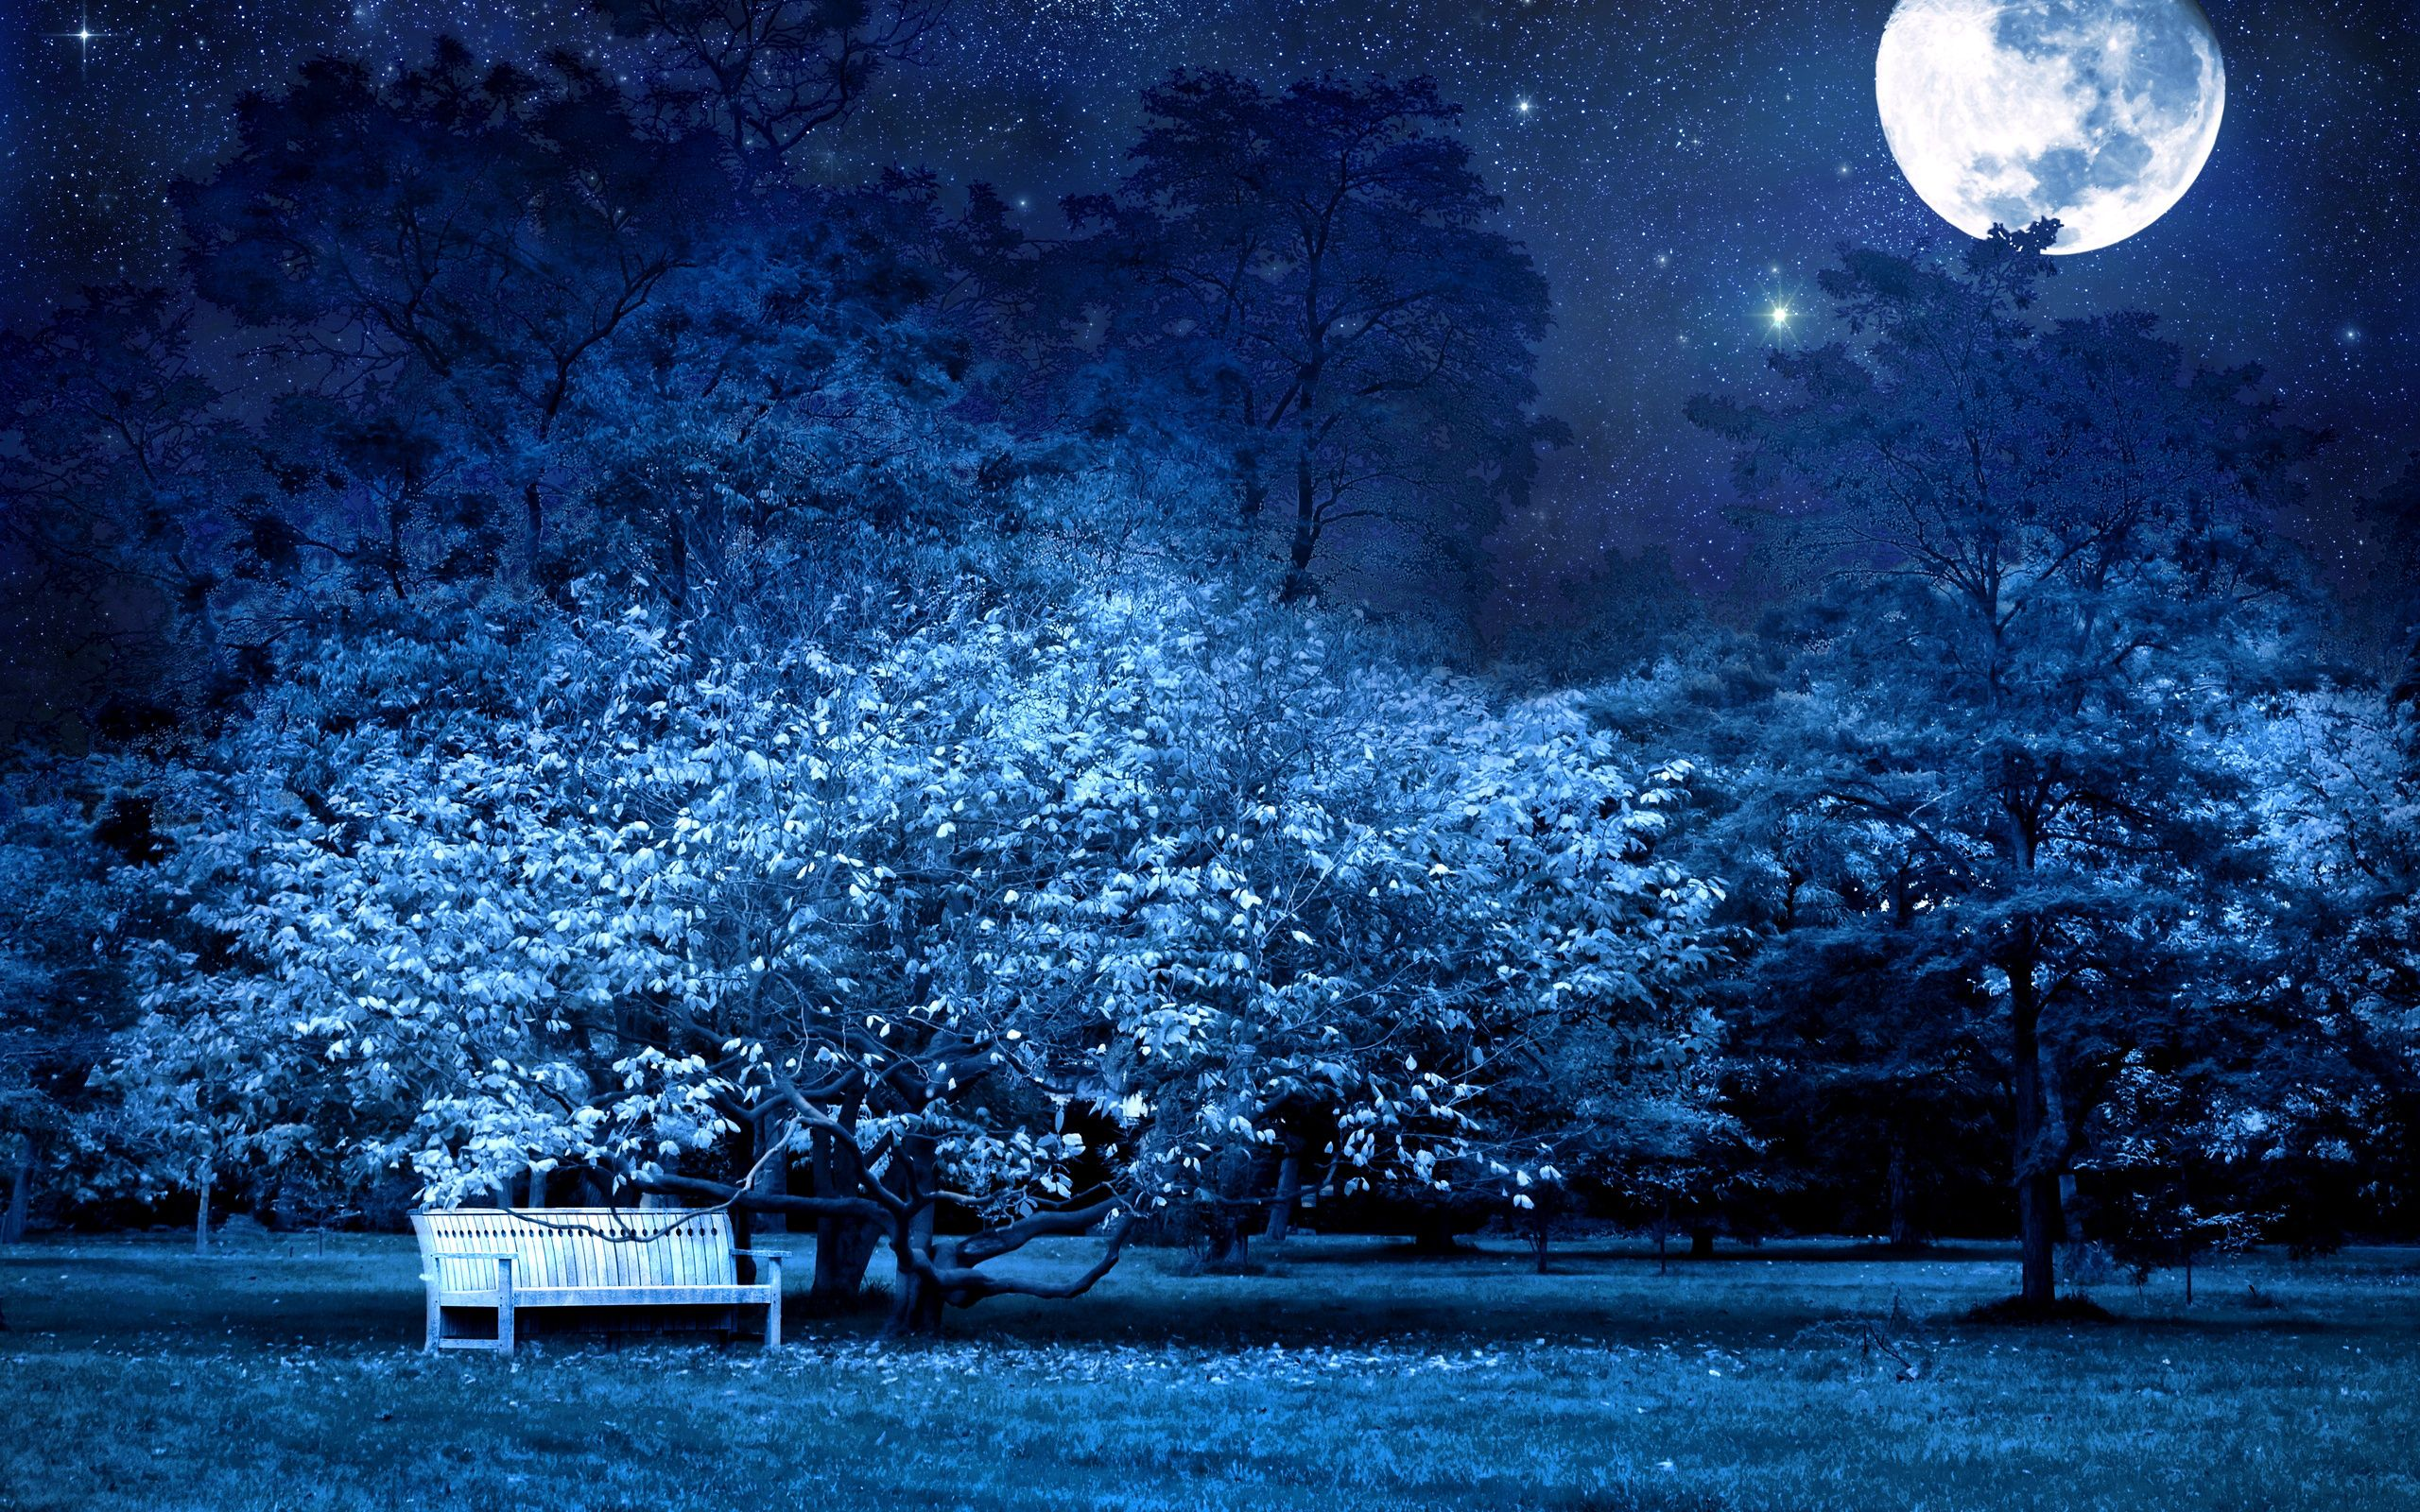 Wallpaper Nature Park Night Moon Tree Bench Secret Hd Desktop Full Moon Night Nature Sky